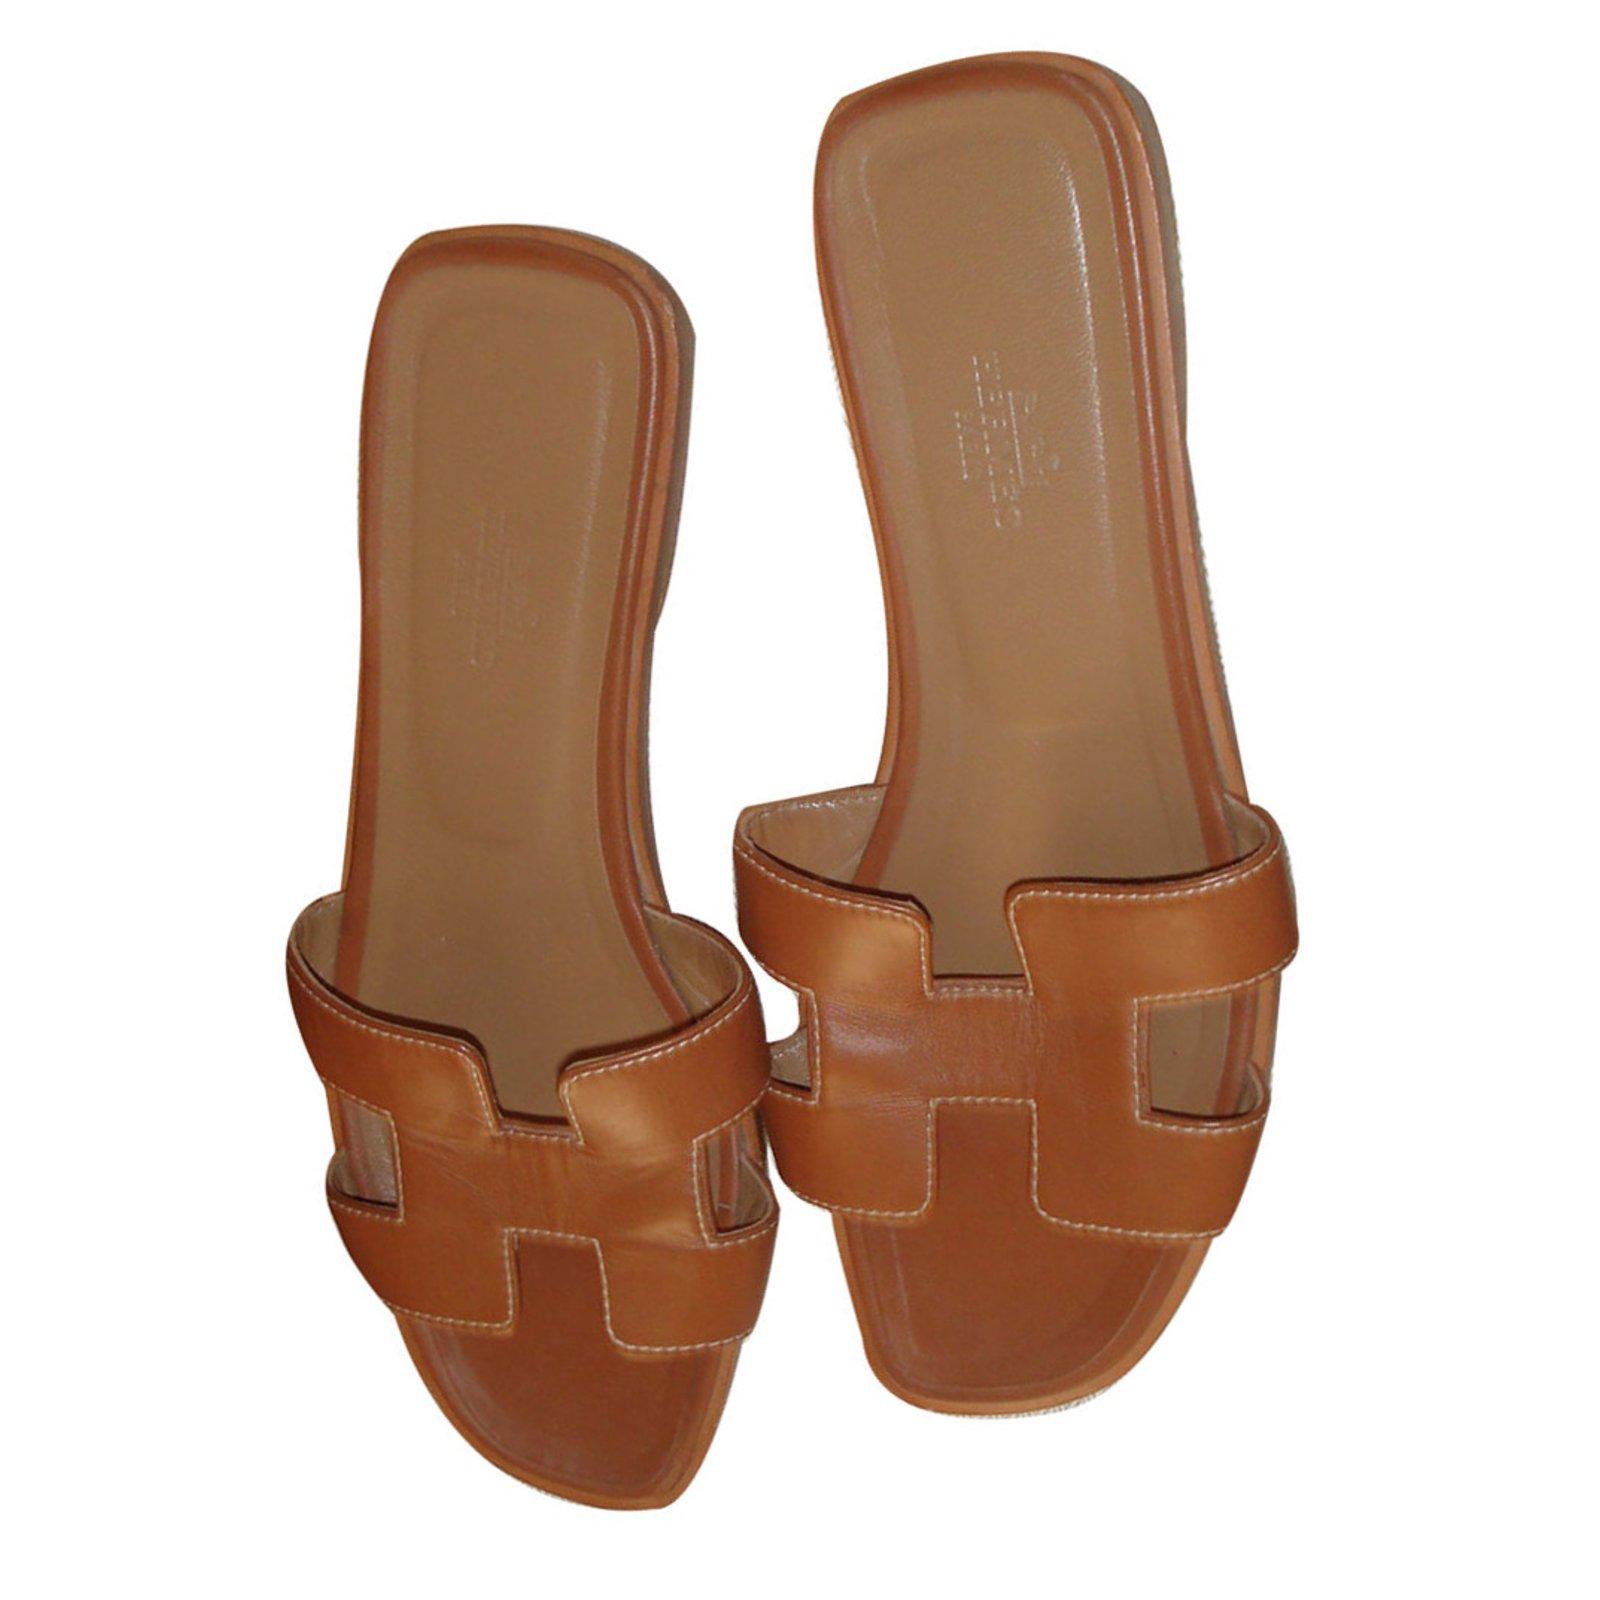 3dc0fafc1968 Sandales Hermès Sandales ORAN Cuir Marron ref.13057 - Joli Closet